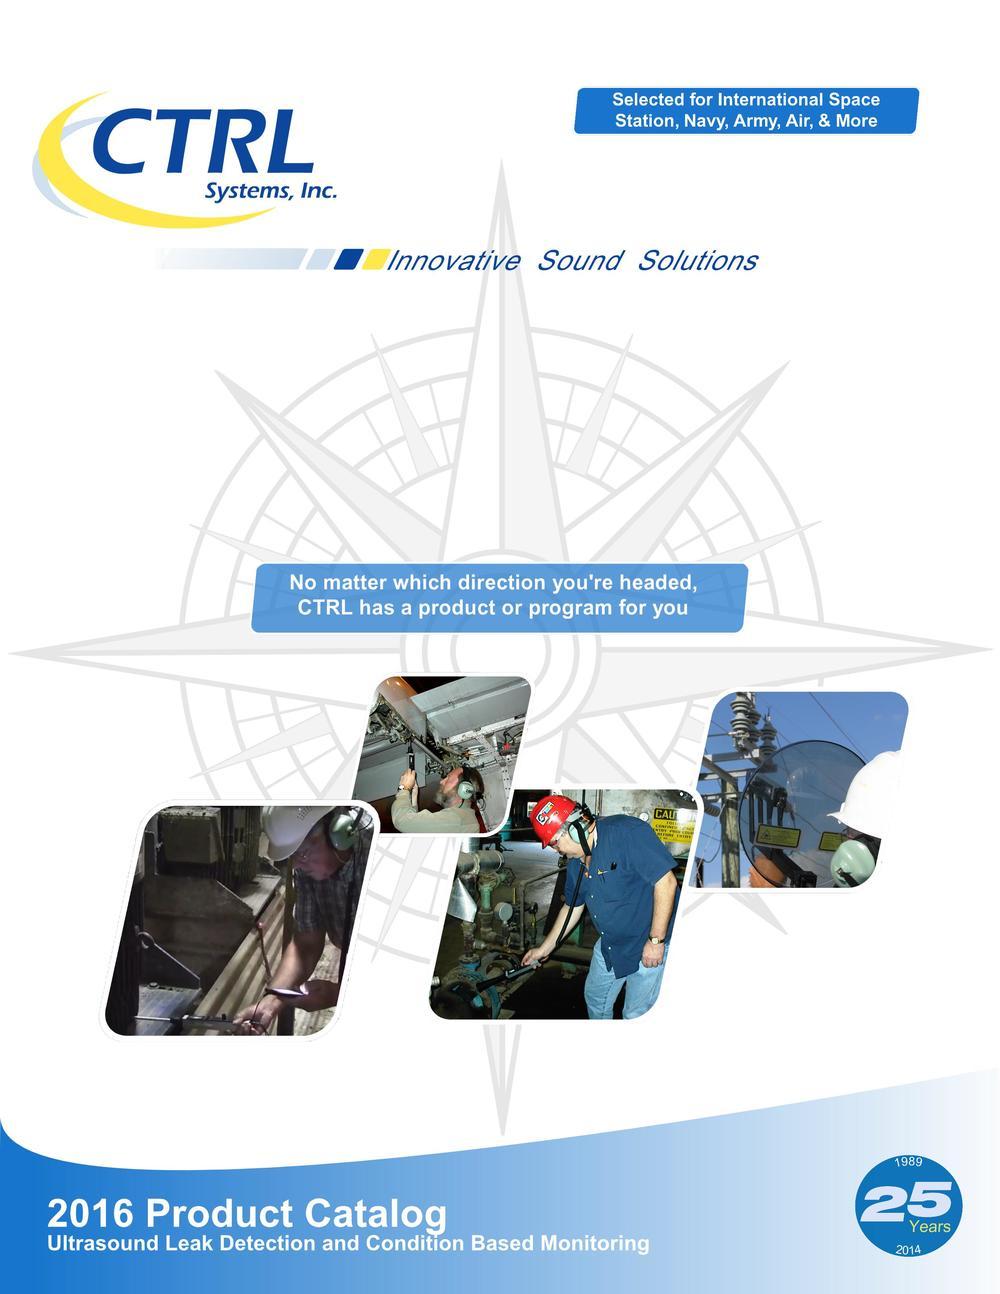 CTRL Product Catalog